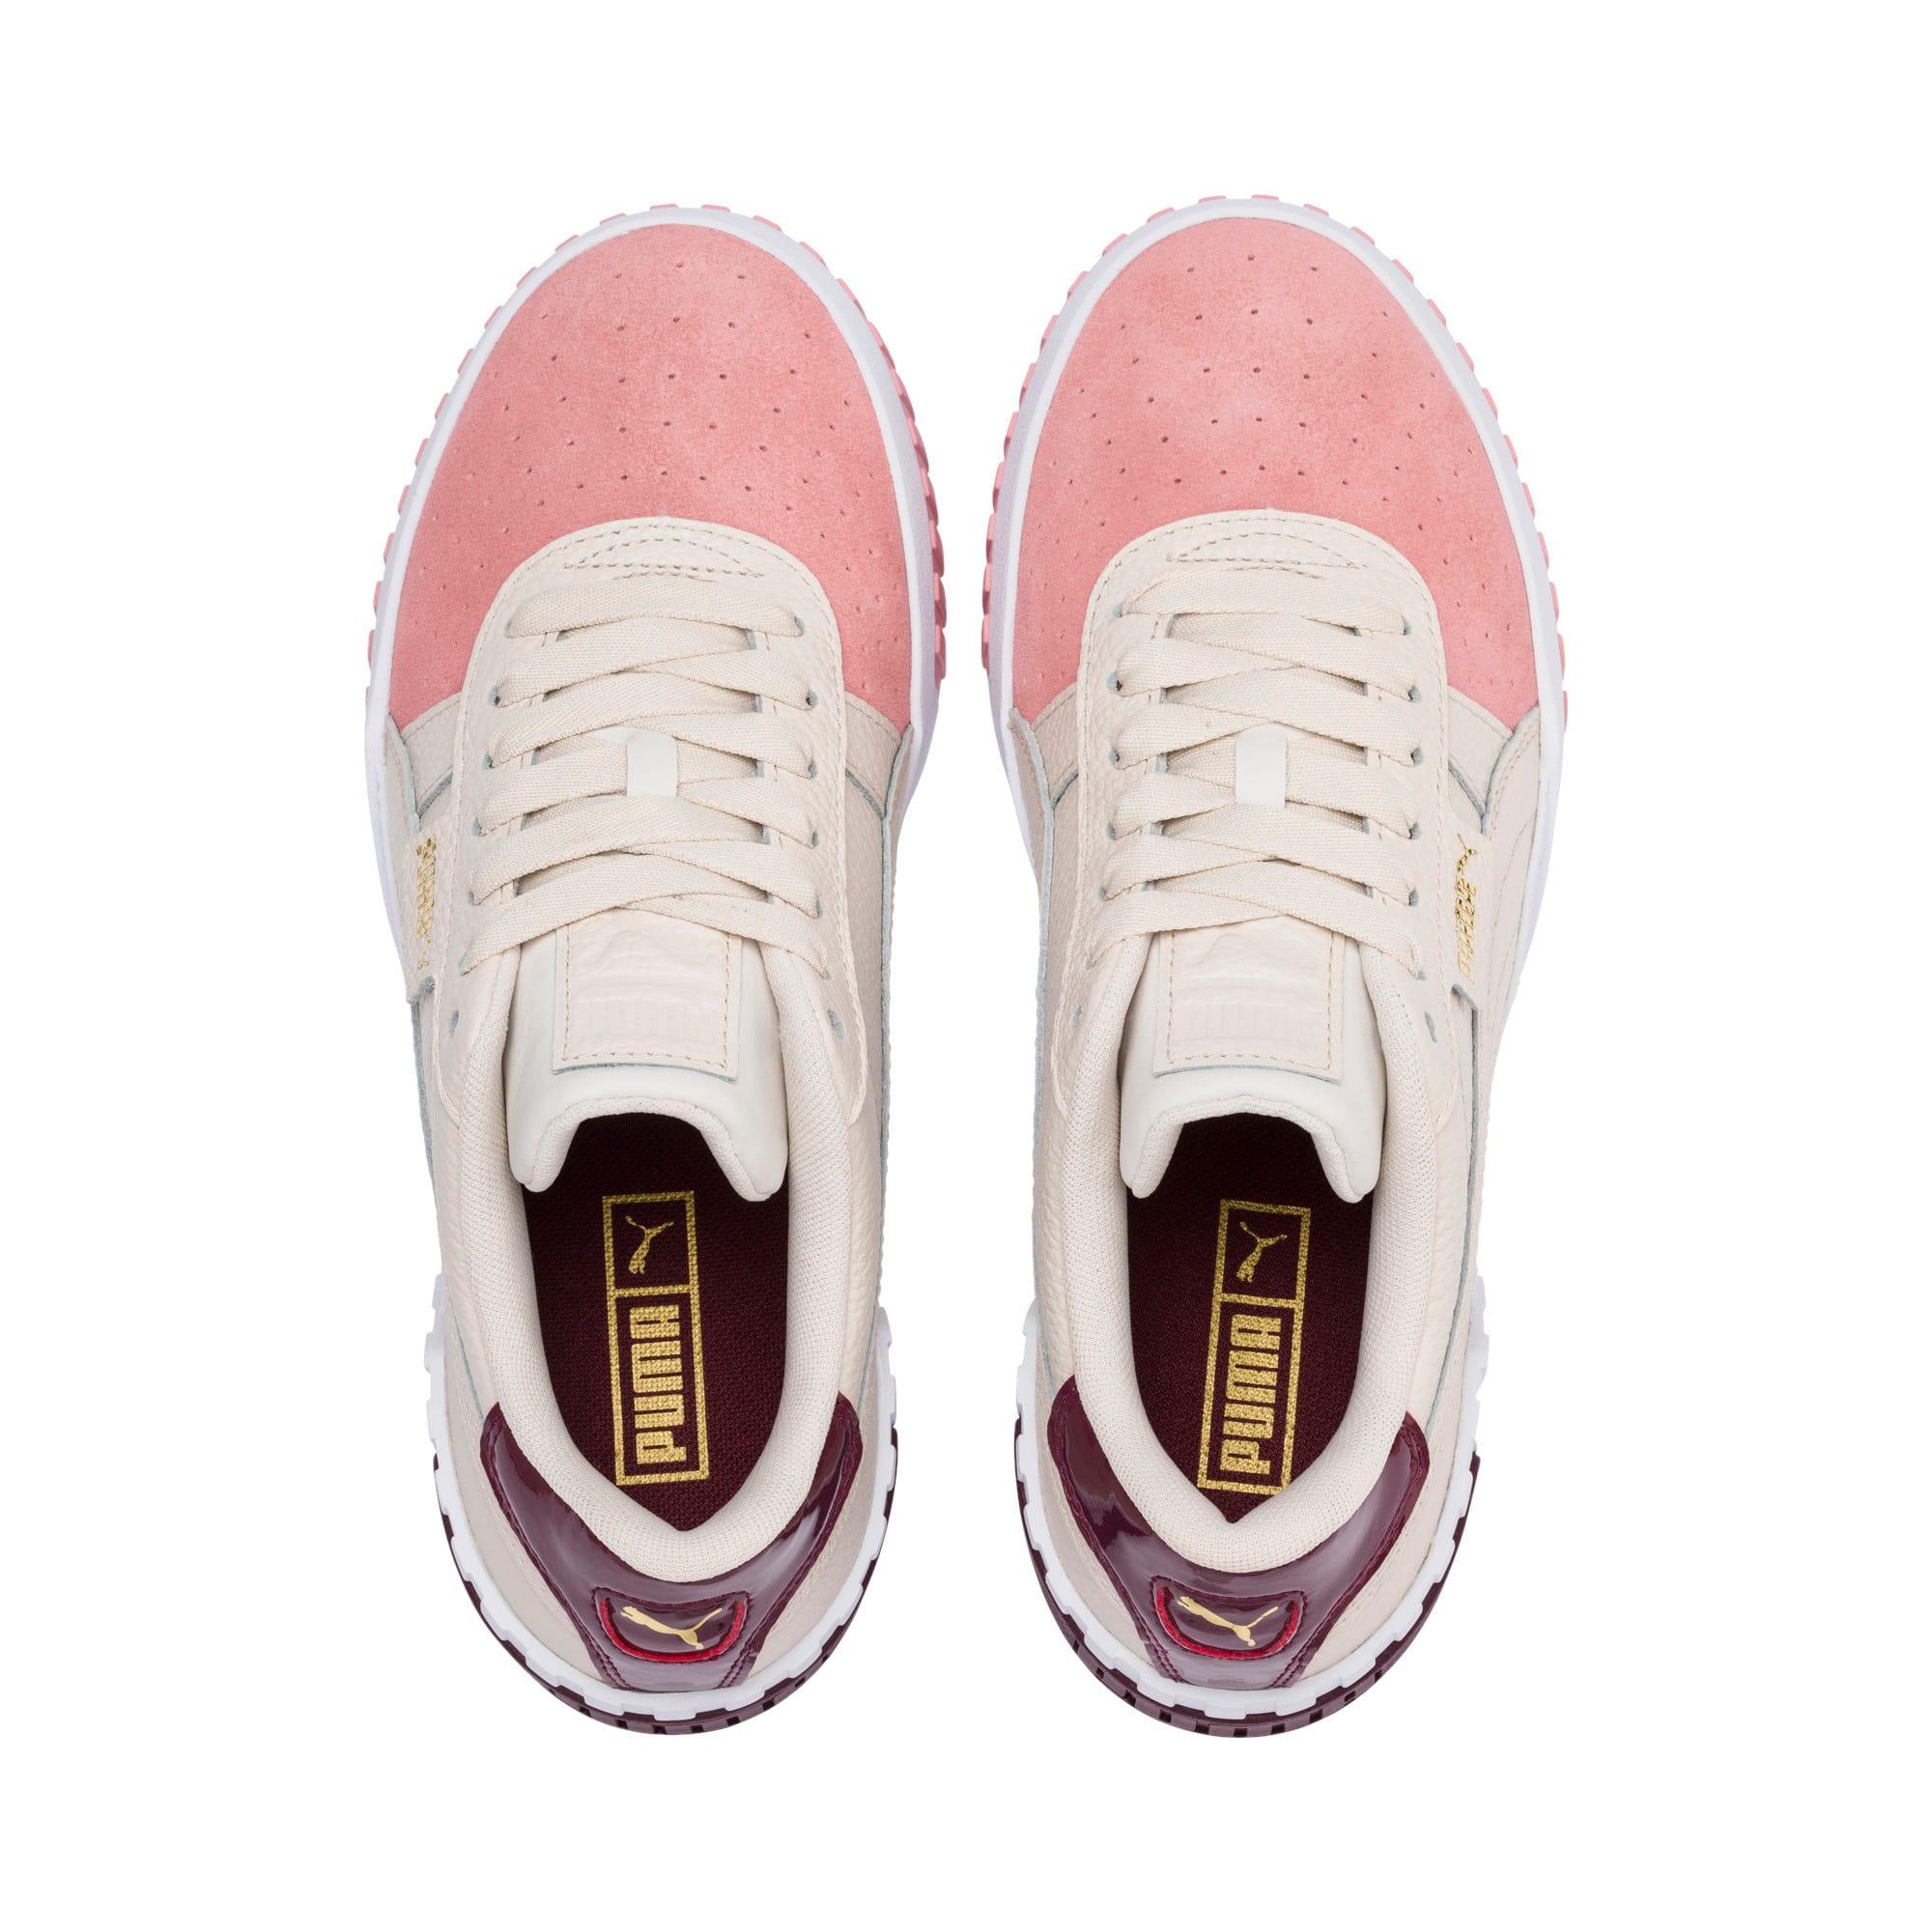 Thumbnail 7 of Cali Remix Damen Sneaker, Pastel Parchment-Bridal Rose, medium